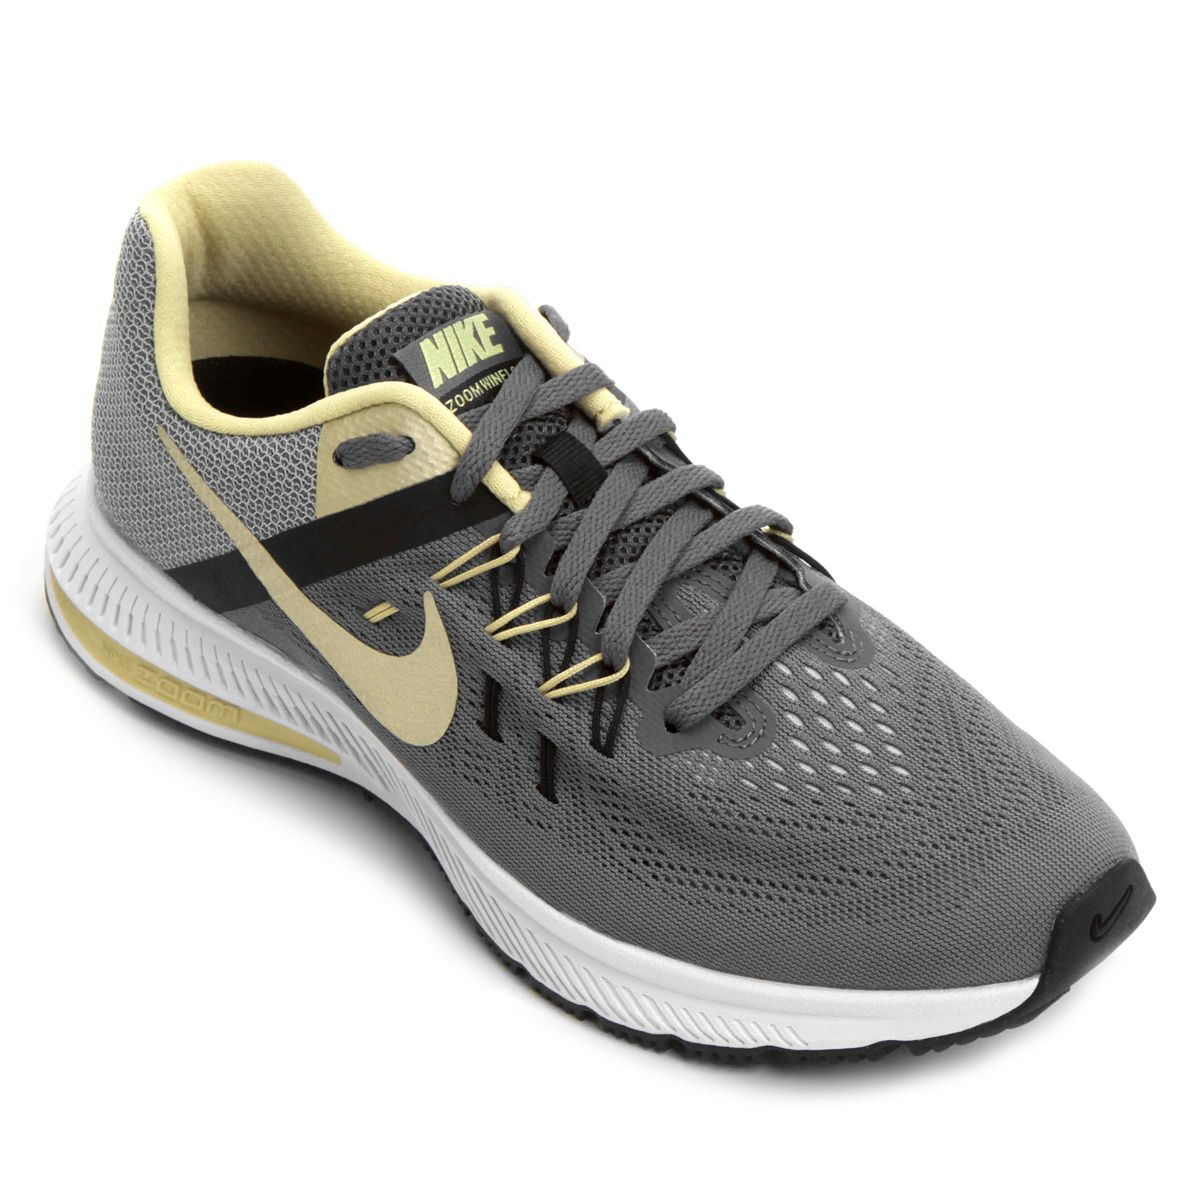 9ec633bc66 Tênis Nike Zoom Winflo 2 Masculino - Cinza e Amarelo | Sapatos ...